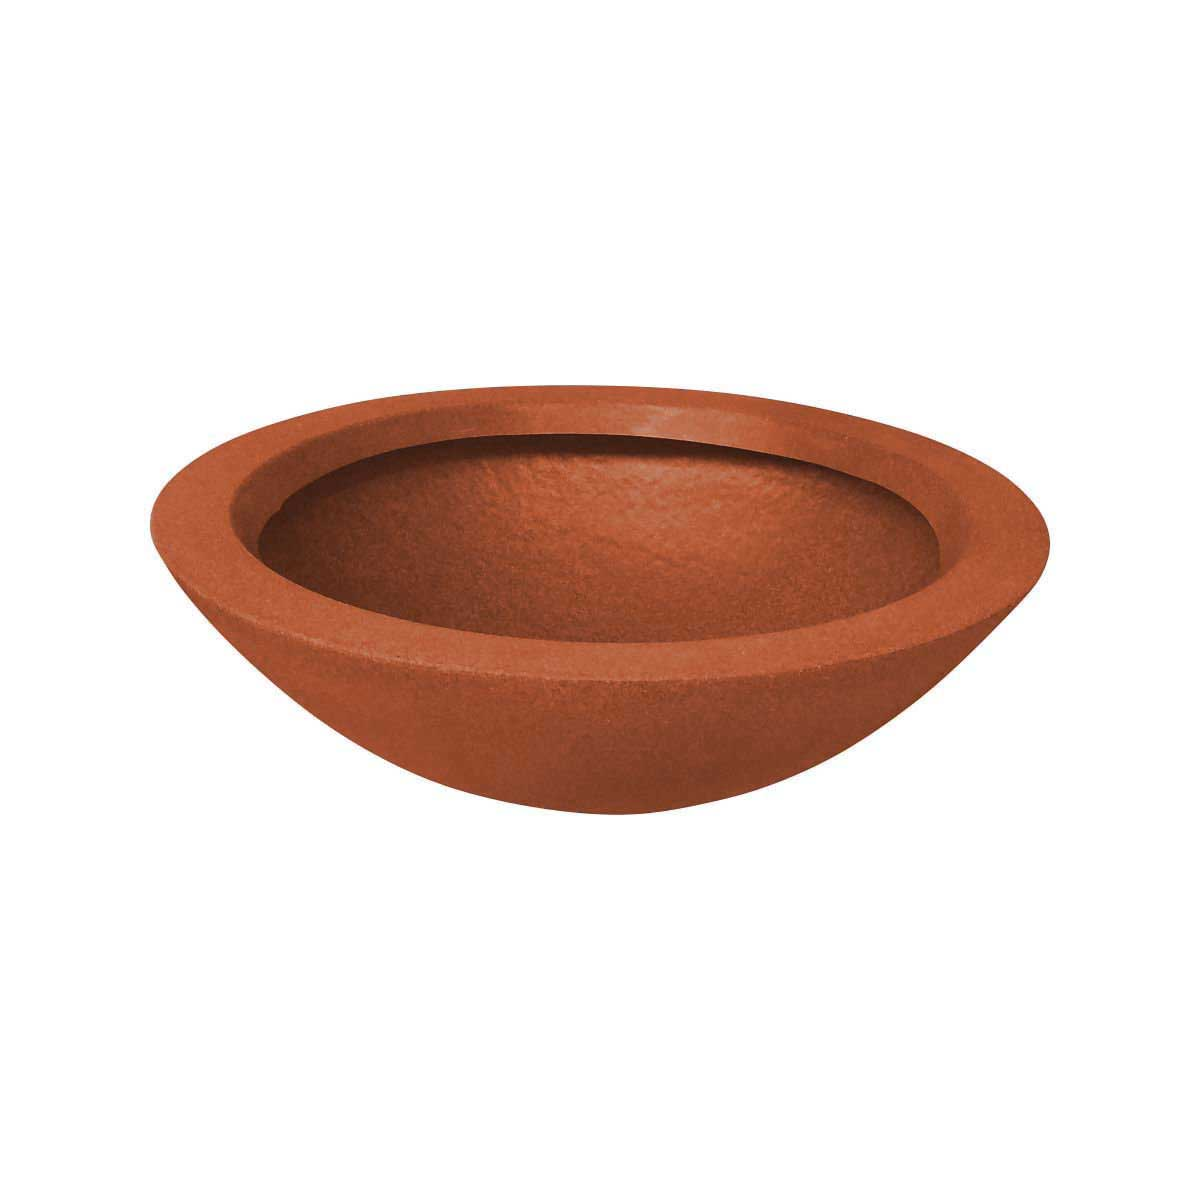 Vaso de Polietileno Bacia P Terracota